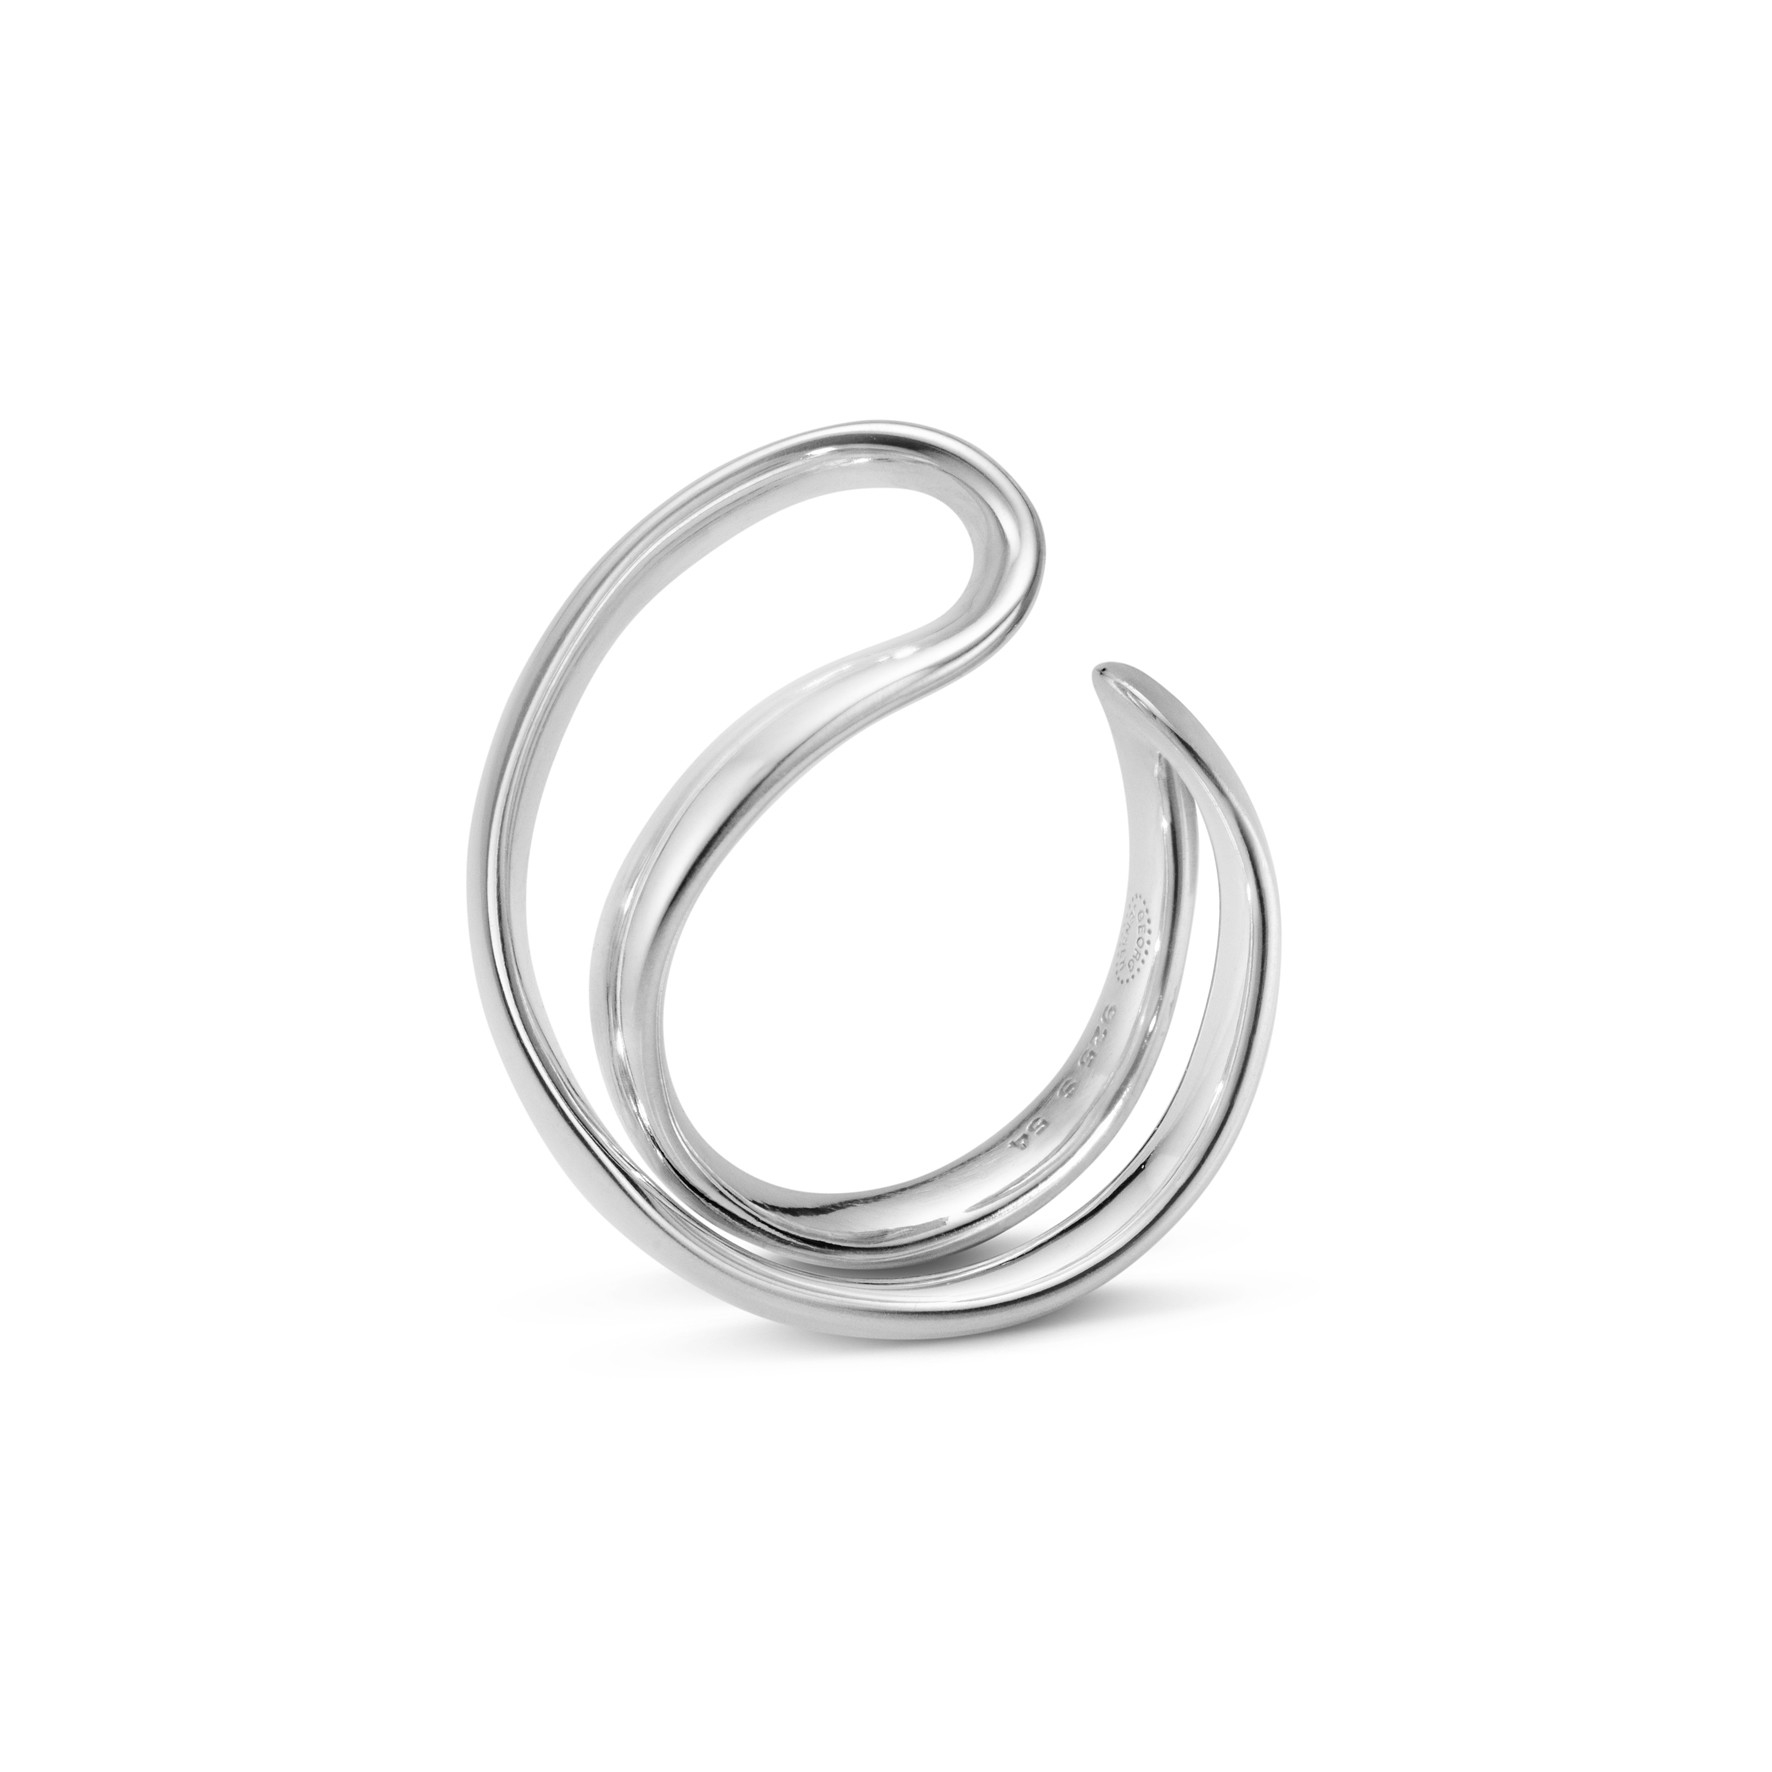 Georg Jensen Infinity Ring